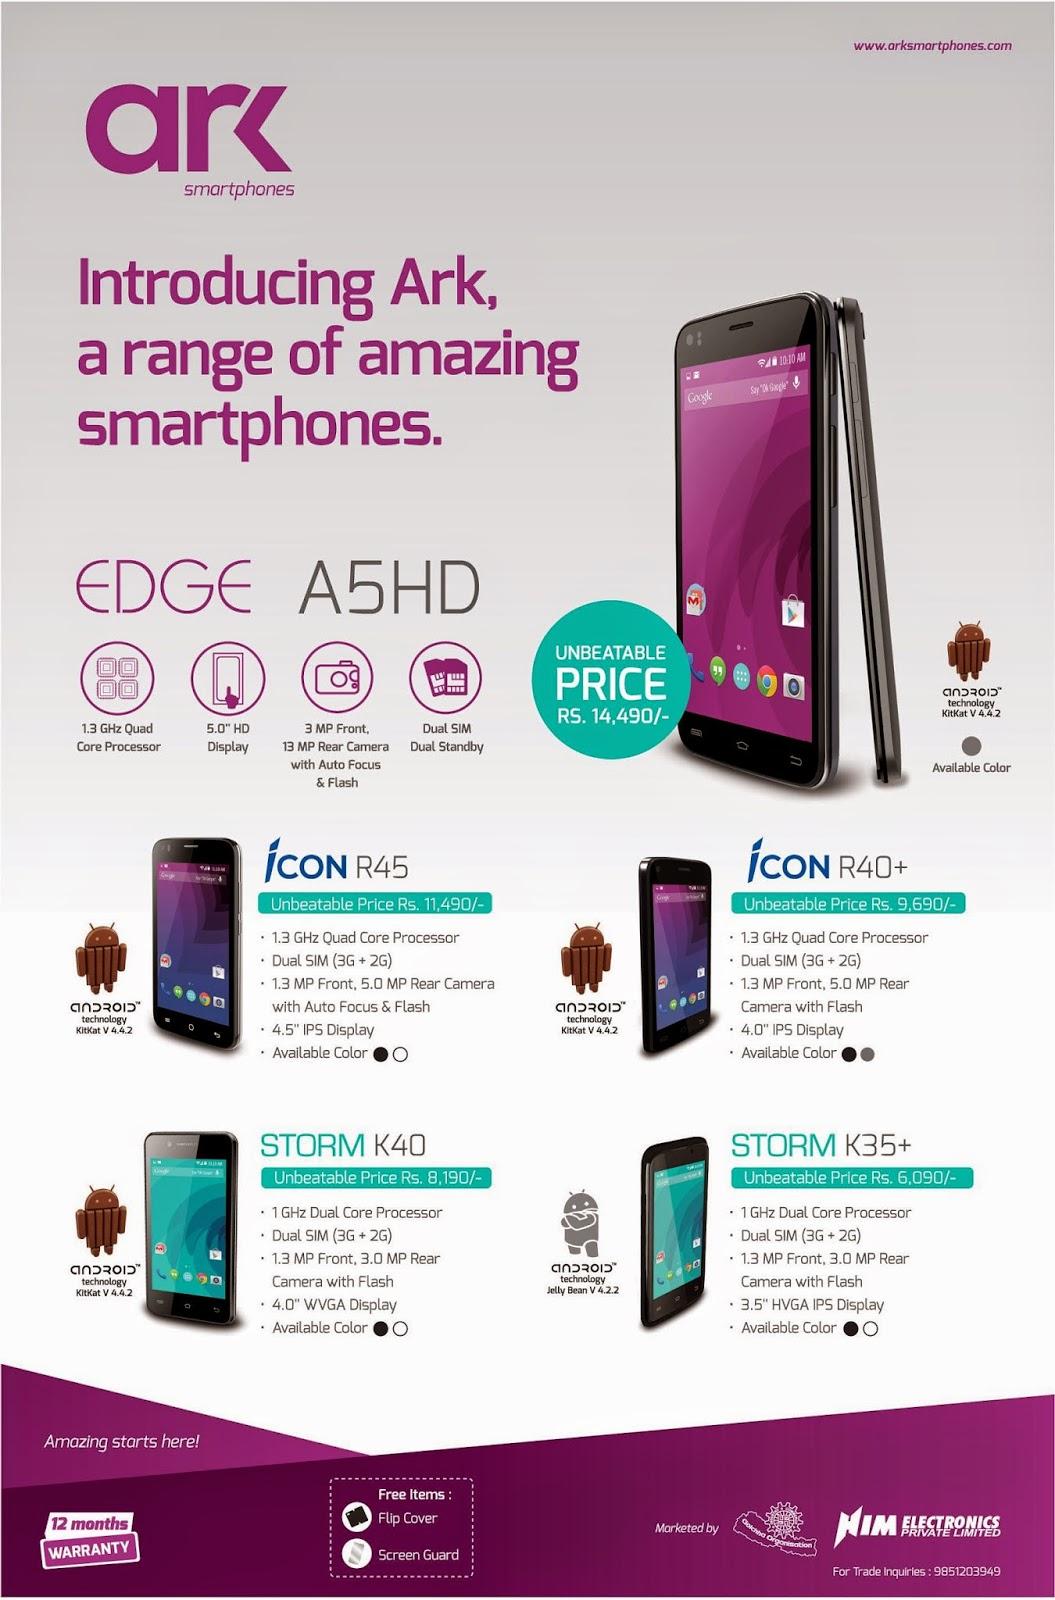 ark nepali brand mobile